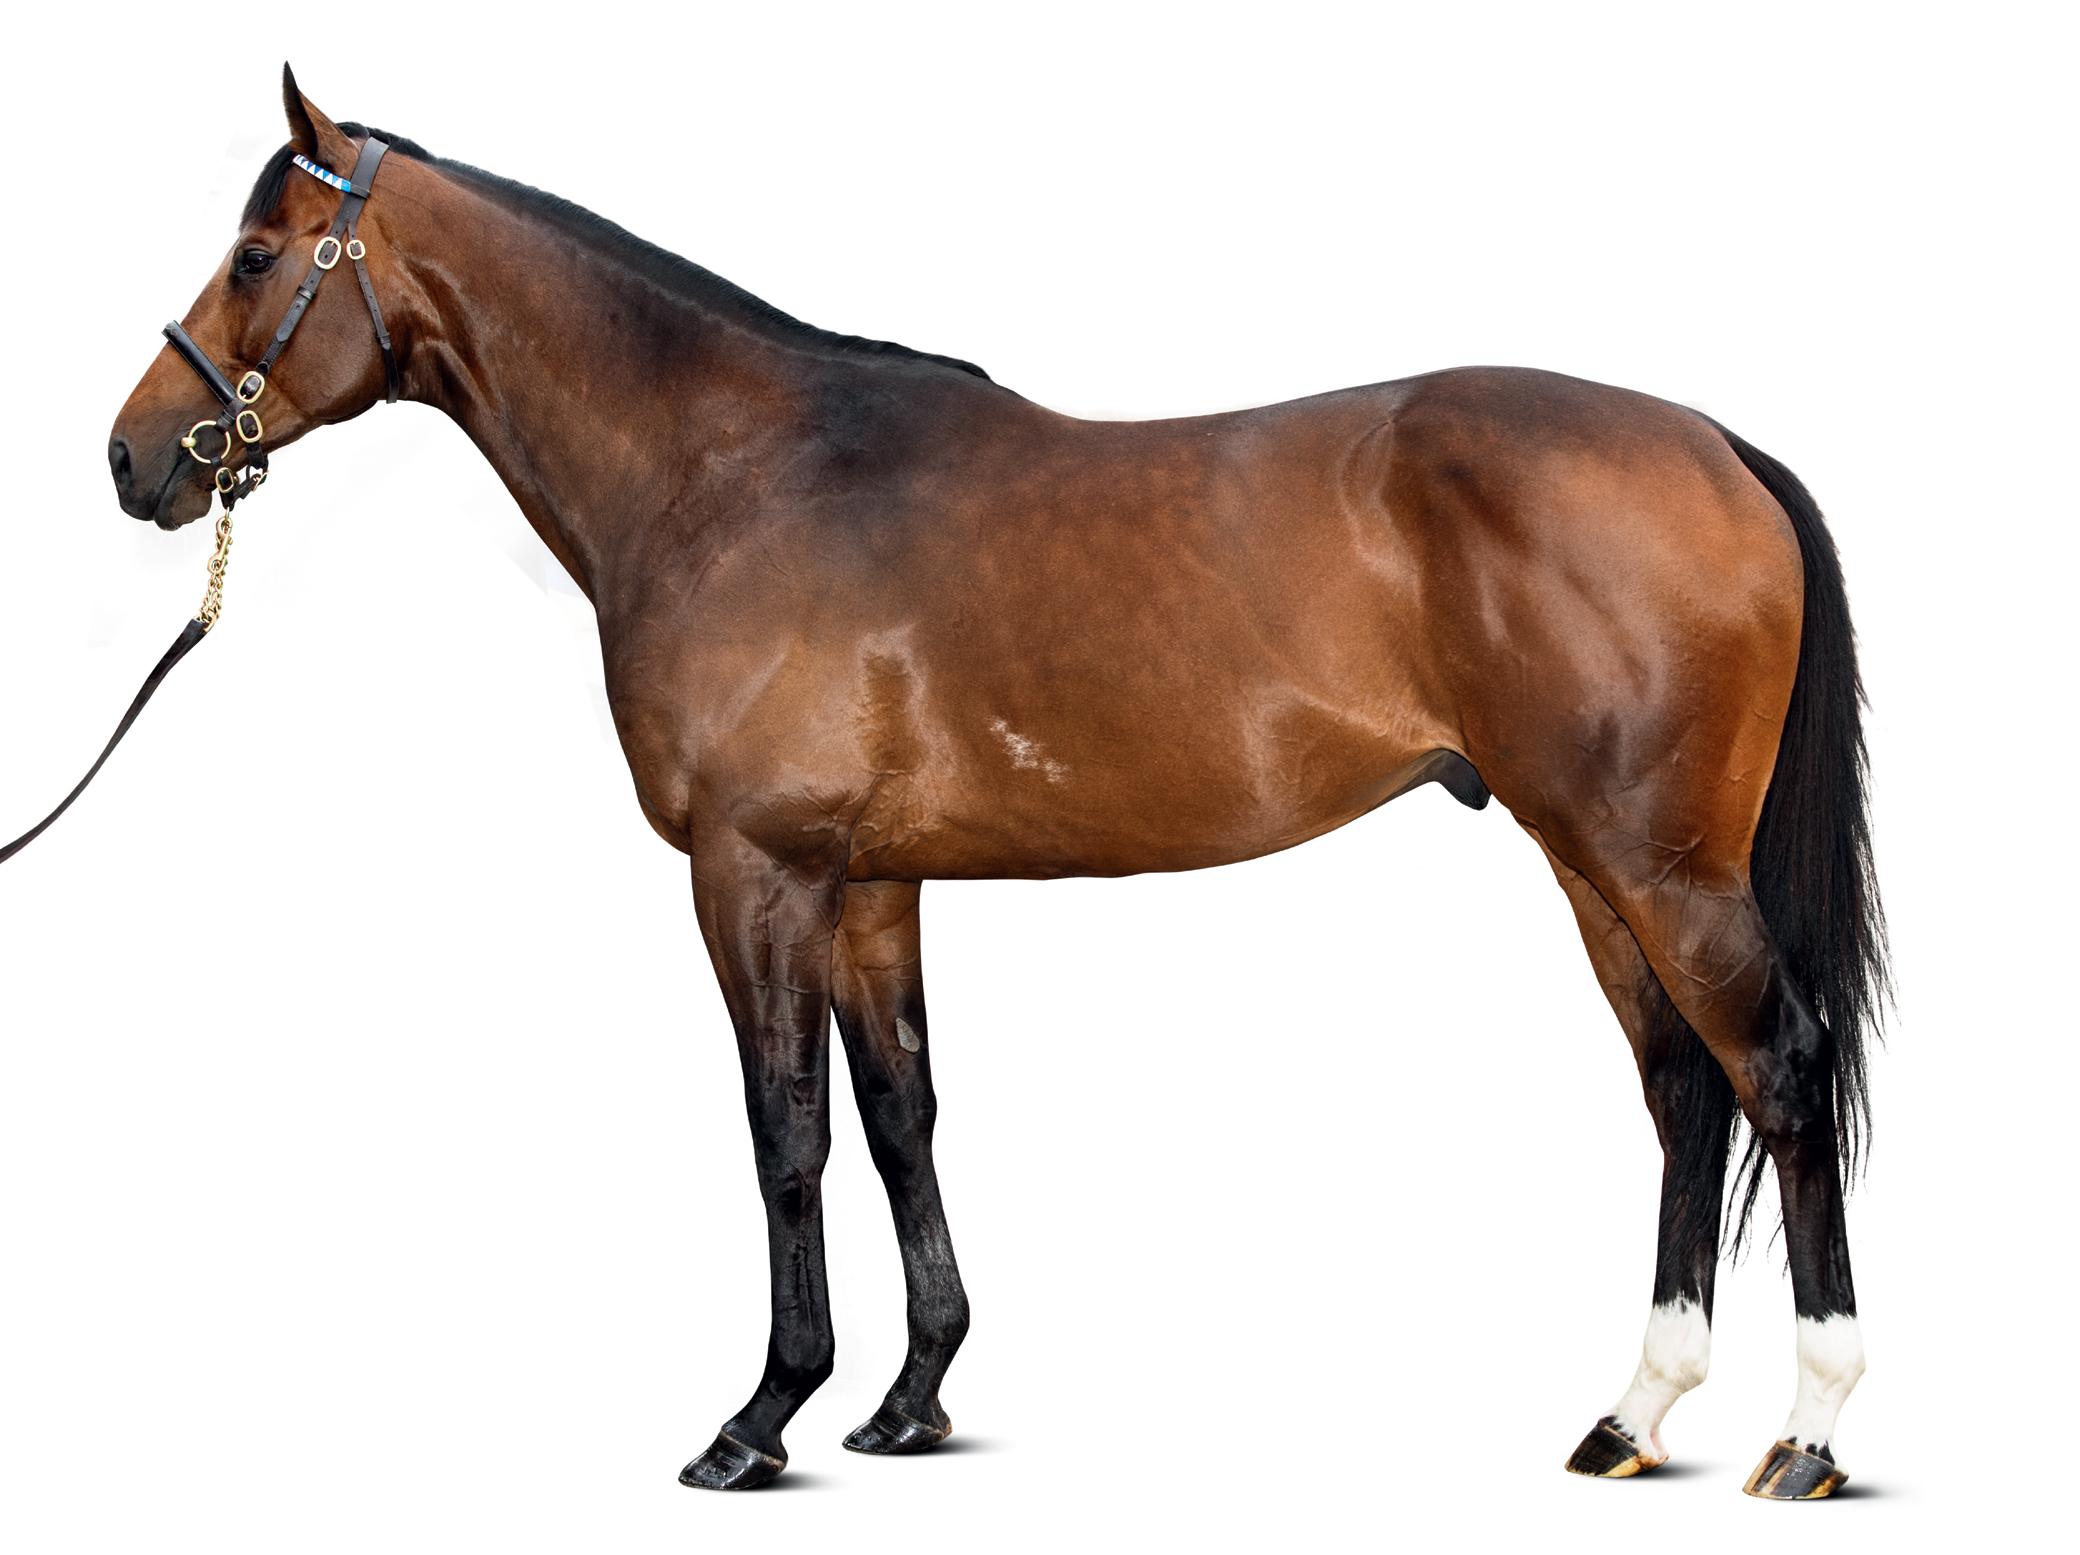 https://www.stallions.com.au/wp-content/uploads/2019/09/conf_ribchester_mr_0190-r_thoroughbred_stallion.jpg